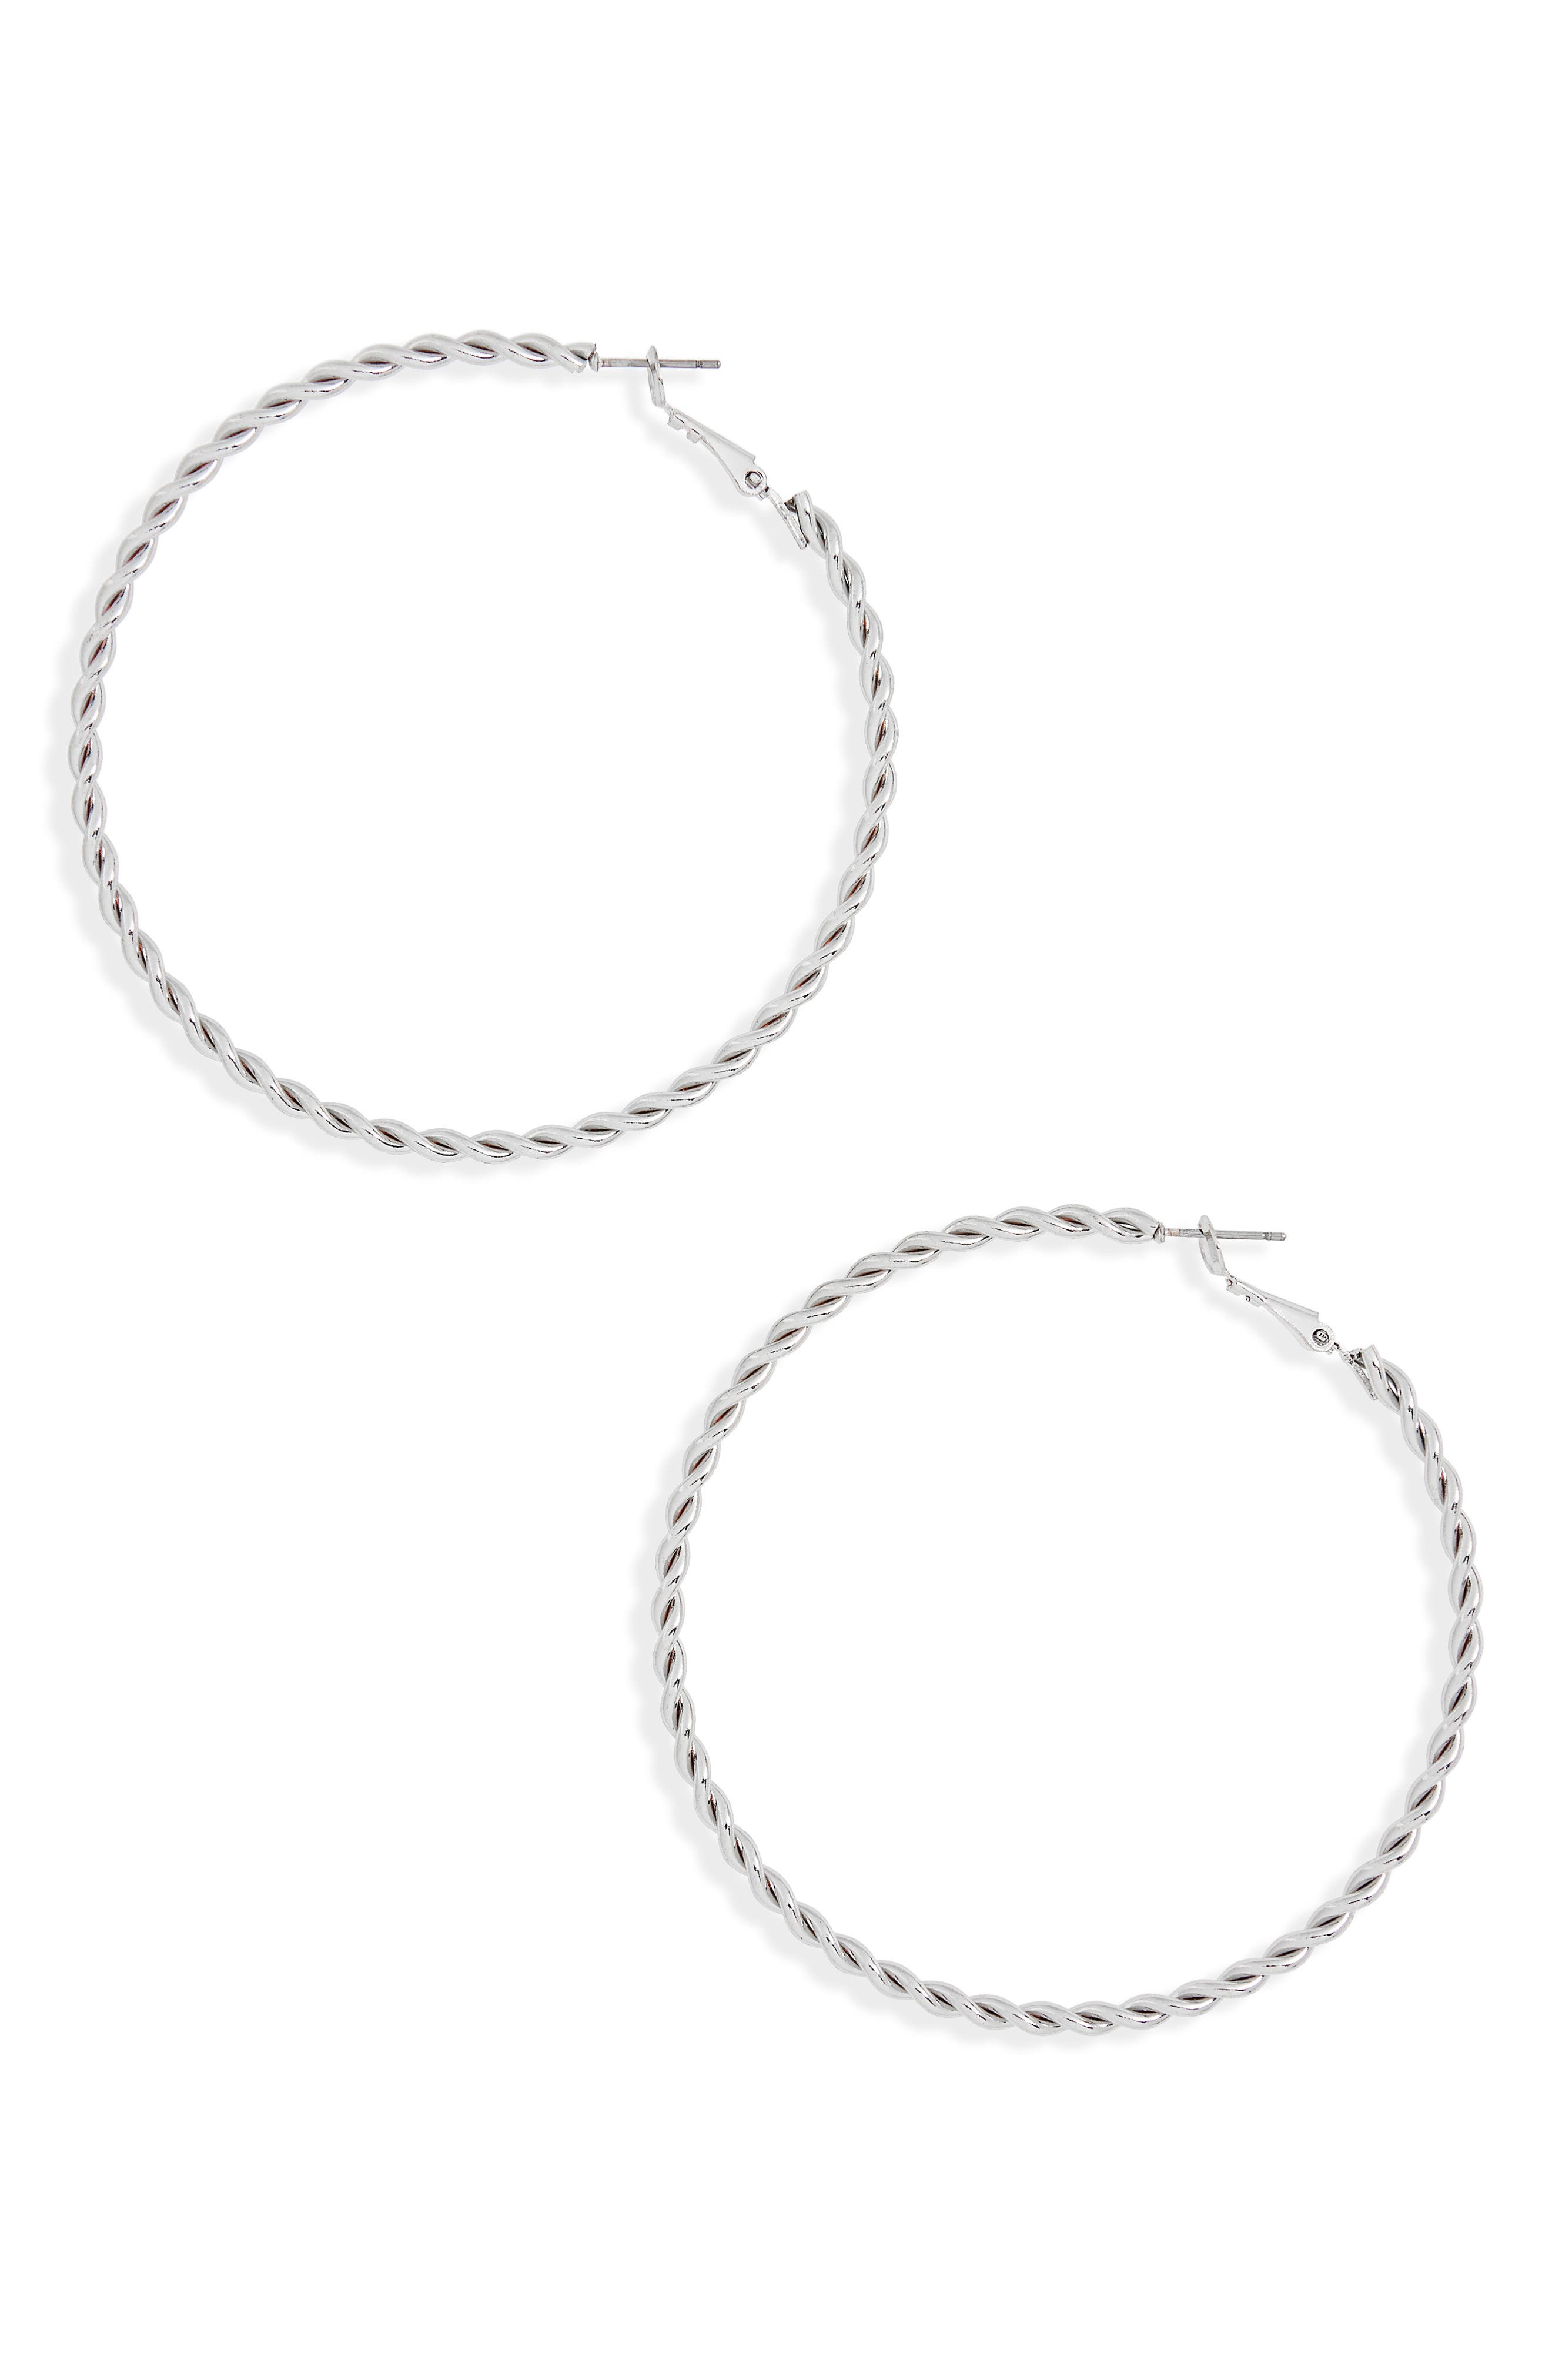 Twisted Hoop Earrings,                             Main thumbnail 1, color,                             040